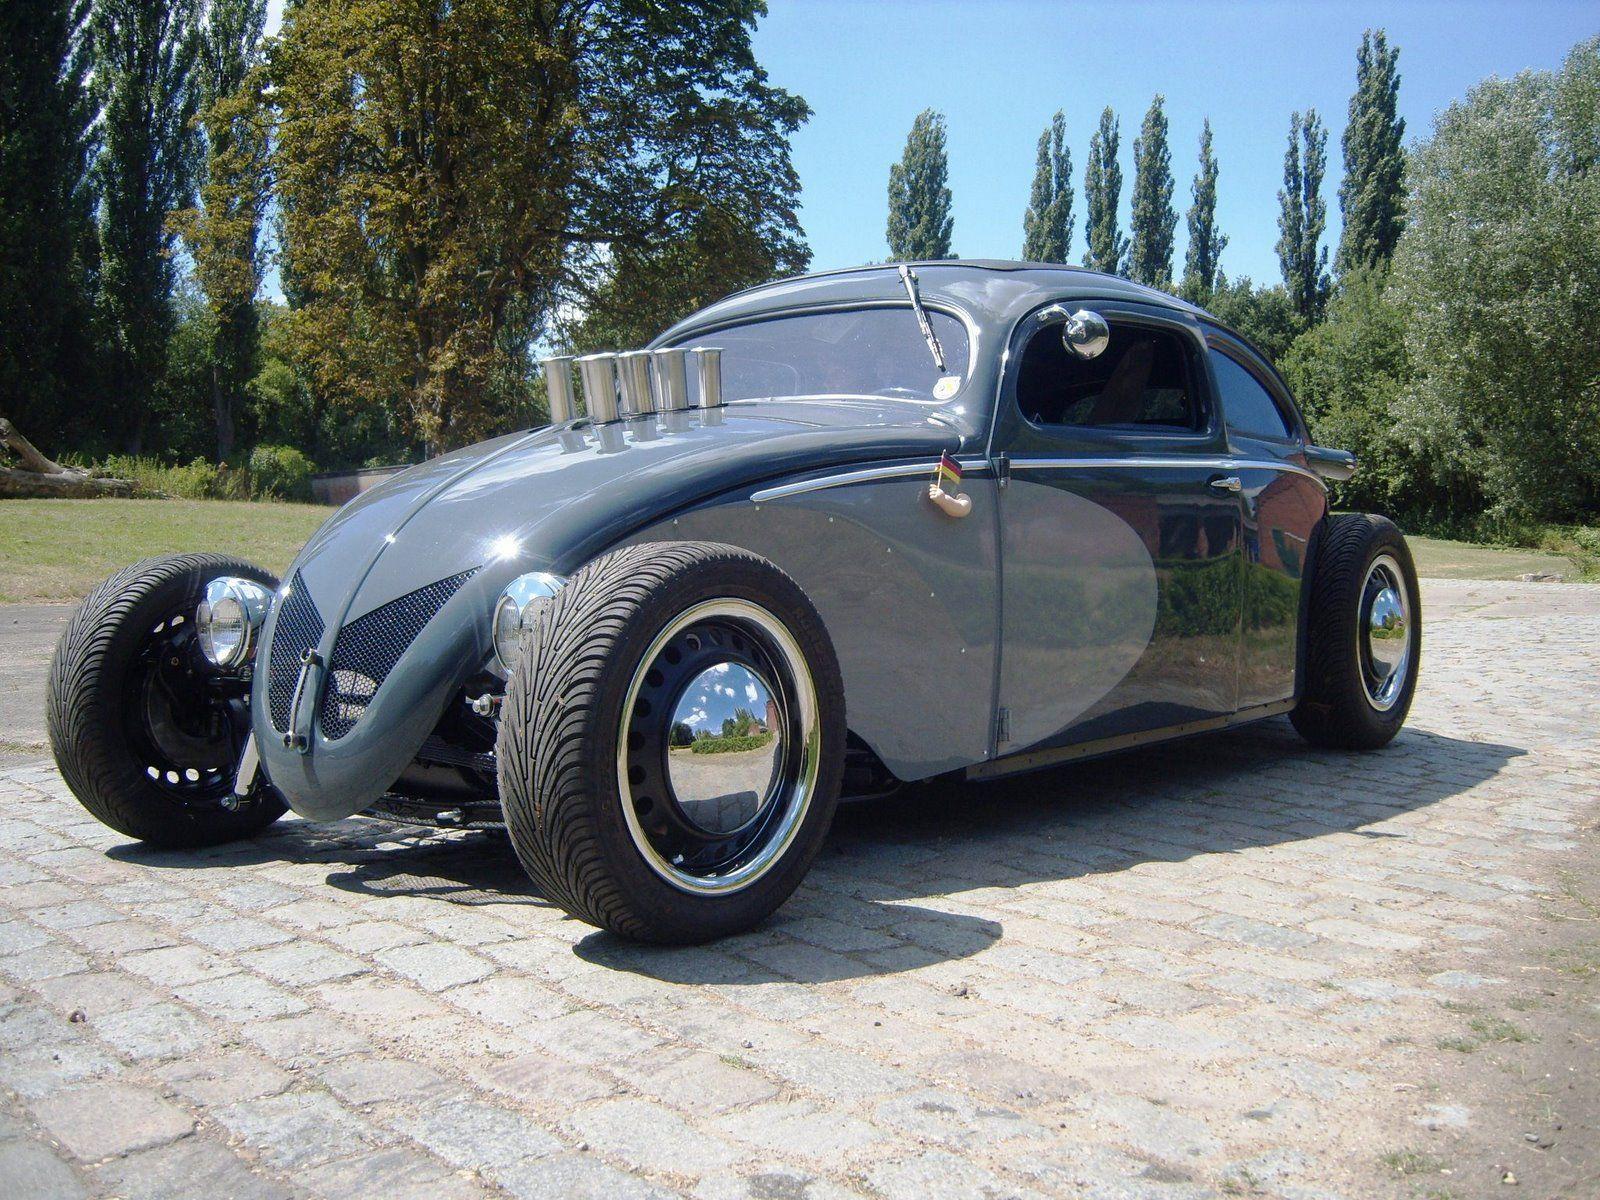 jurgens type34\'s: woaaw a\' 54 beetle hot rod V8   VW   Pinterest ...